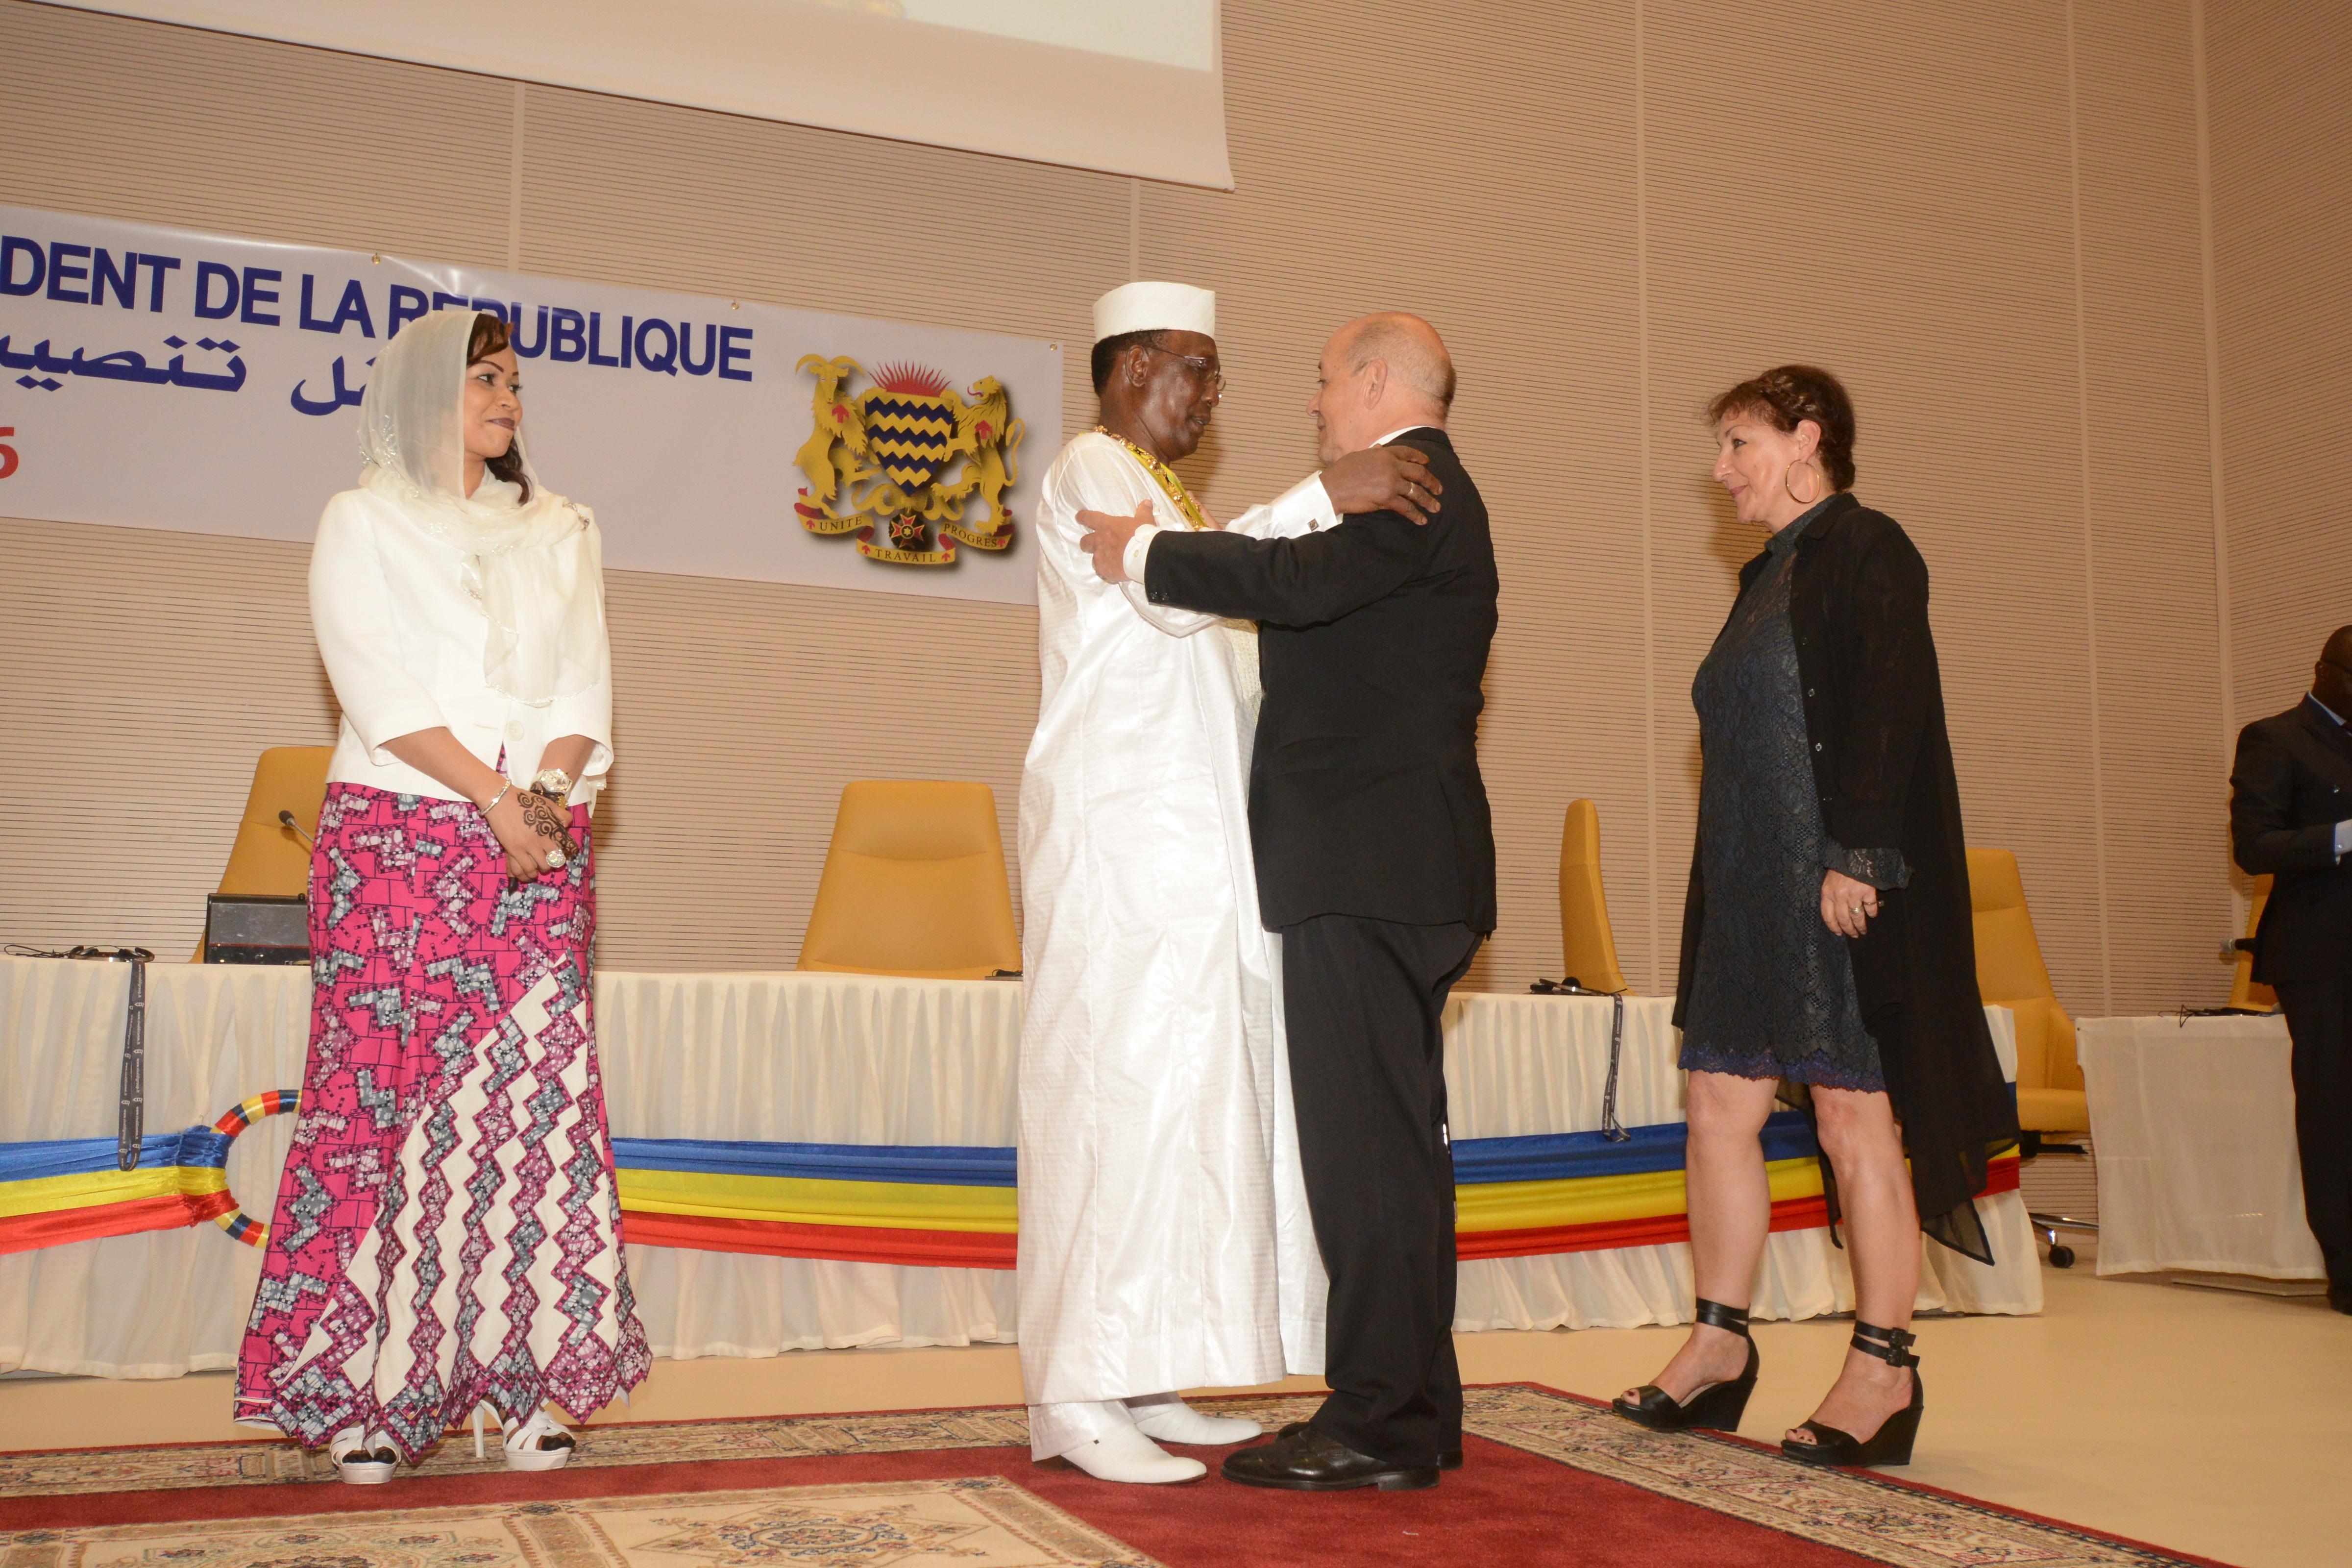 L'accolade d'Idriss Déby et de Jean-Yves Le Drian, lors de l'investiture à N'Djamena. Alwihda Info/M.R.